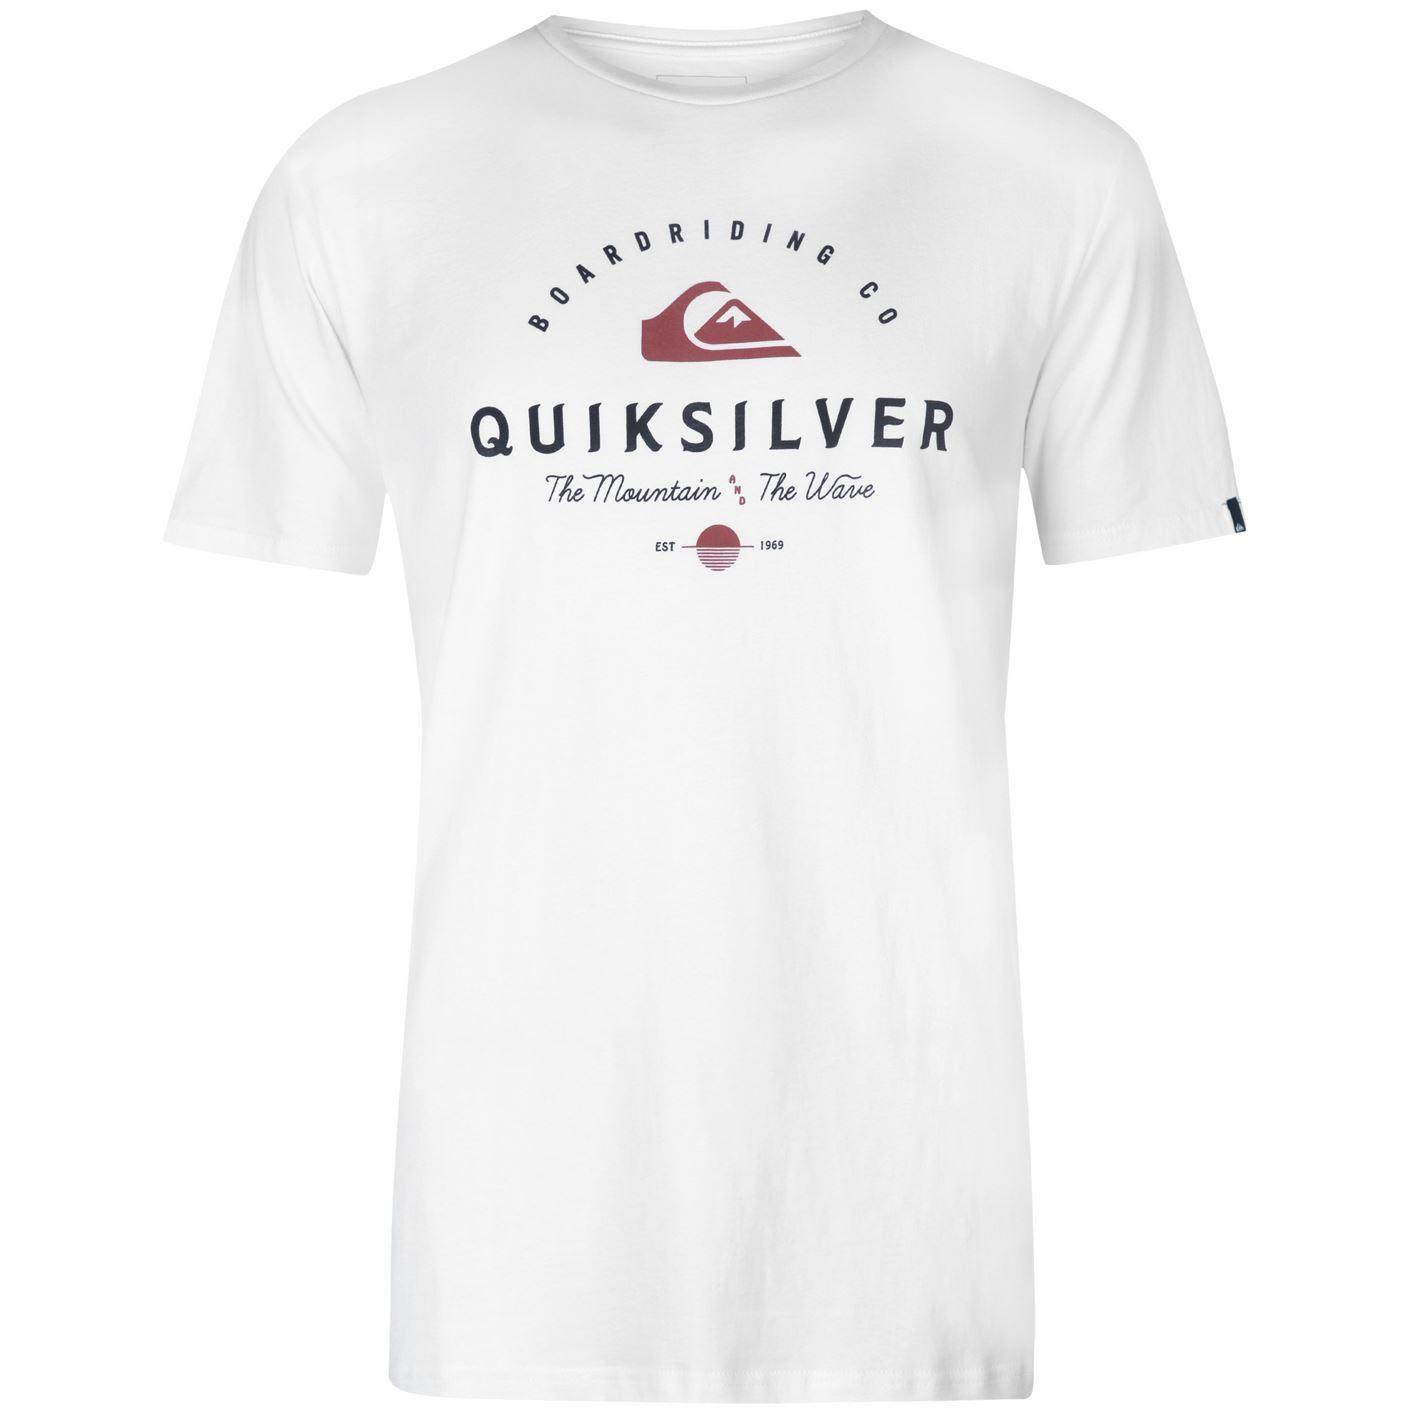 Quiksilver-Working-Man-T-Shirt-Mens-Tee-Shirt-Top thumbnail 11